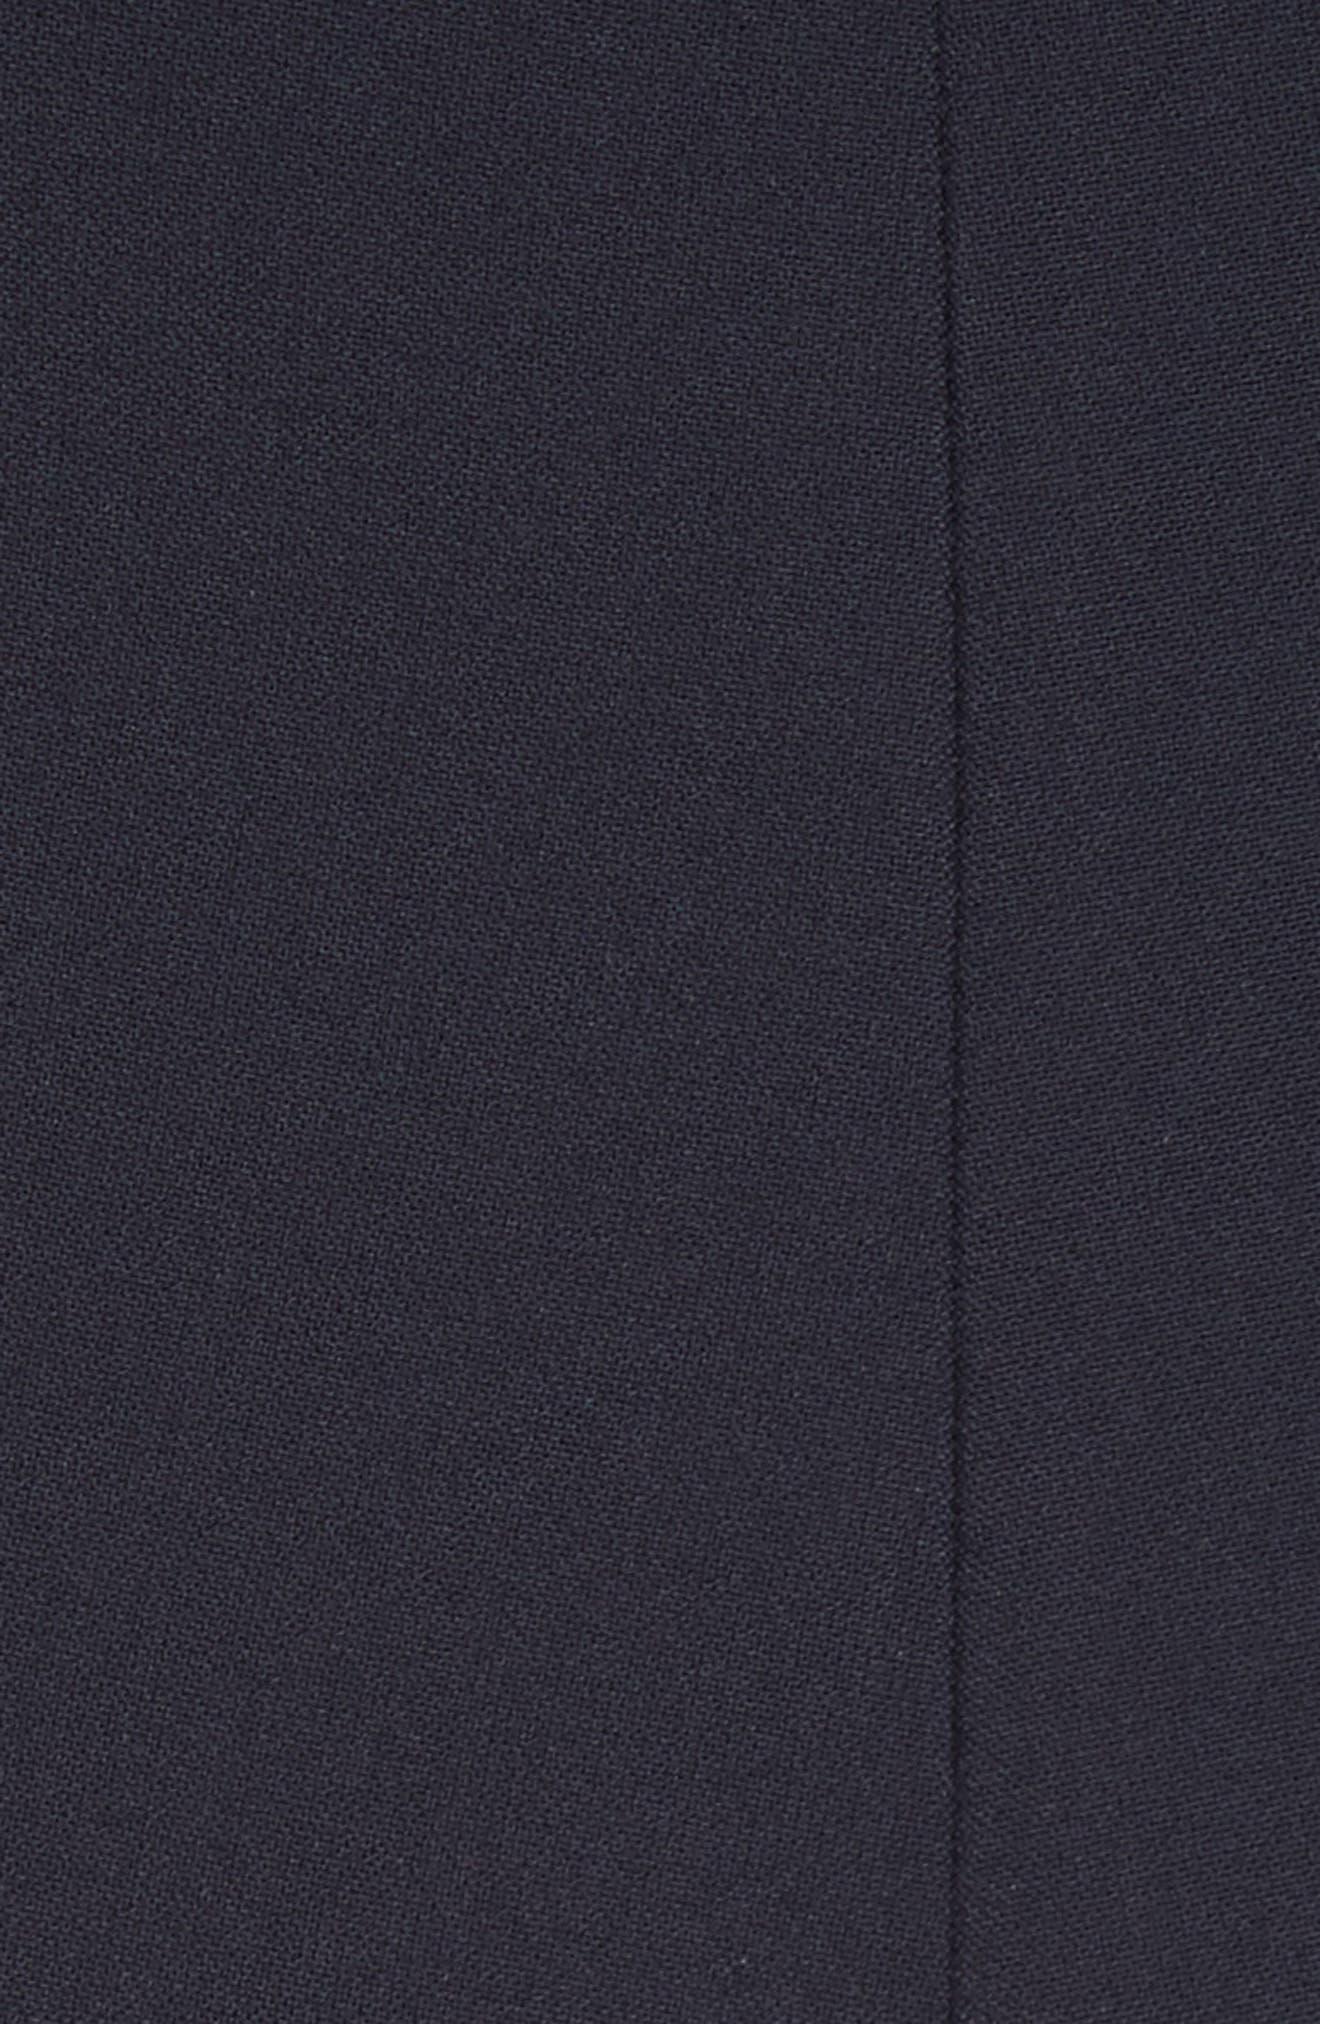 Foldover One Shoulder Jumpsuit,                             Alternate thumbnail 6, color,                             Navy